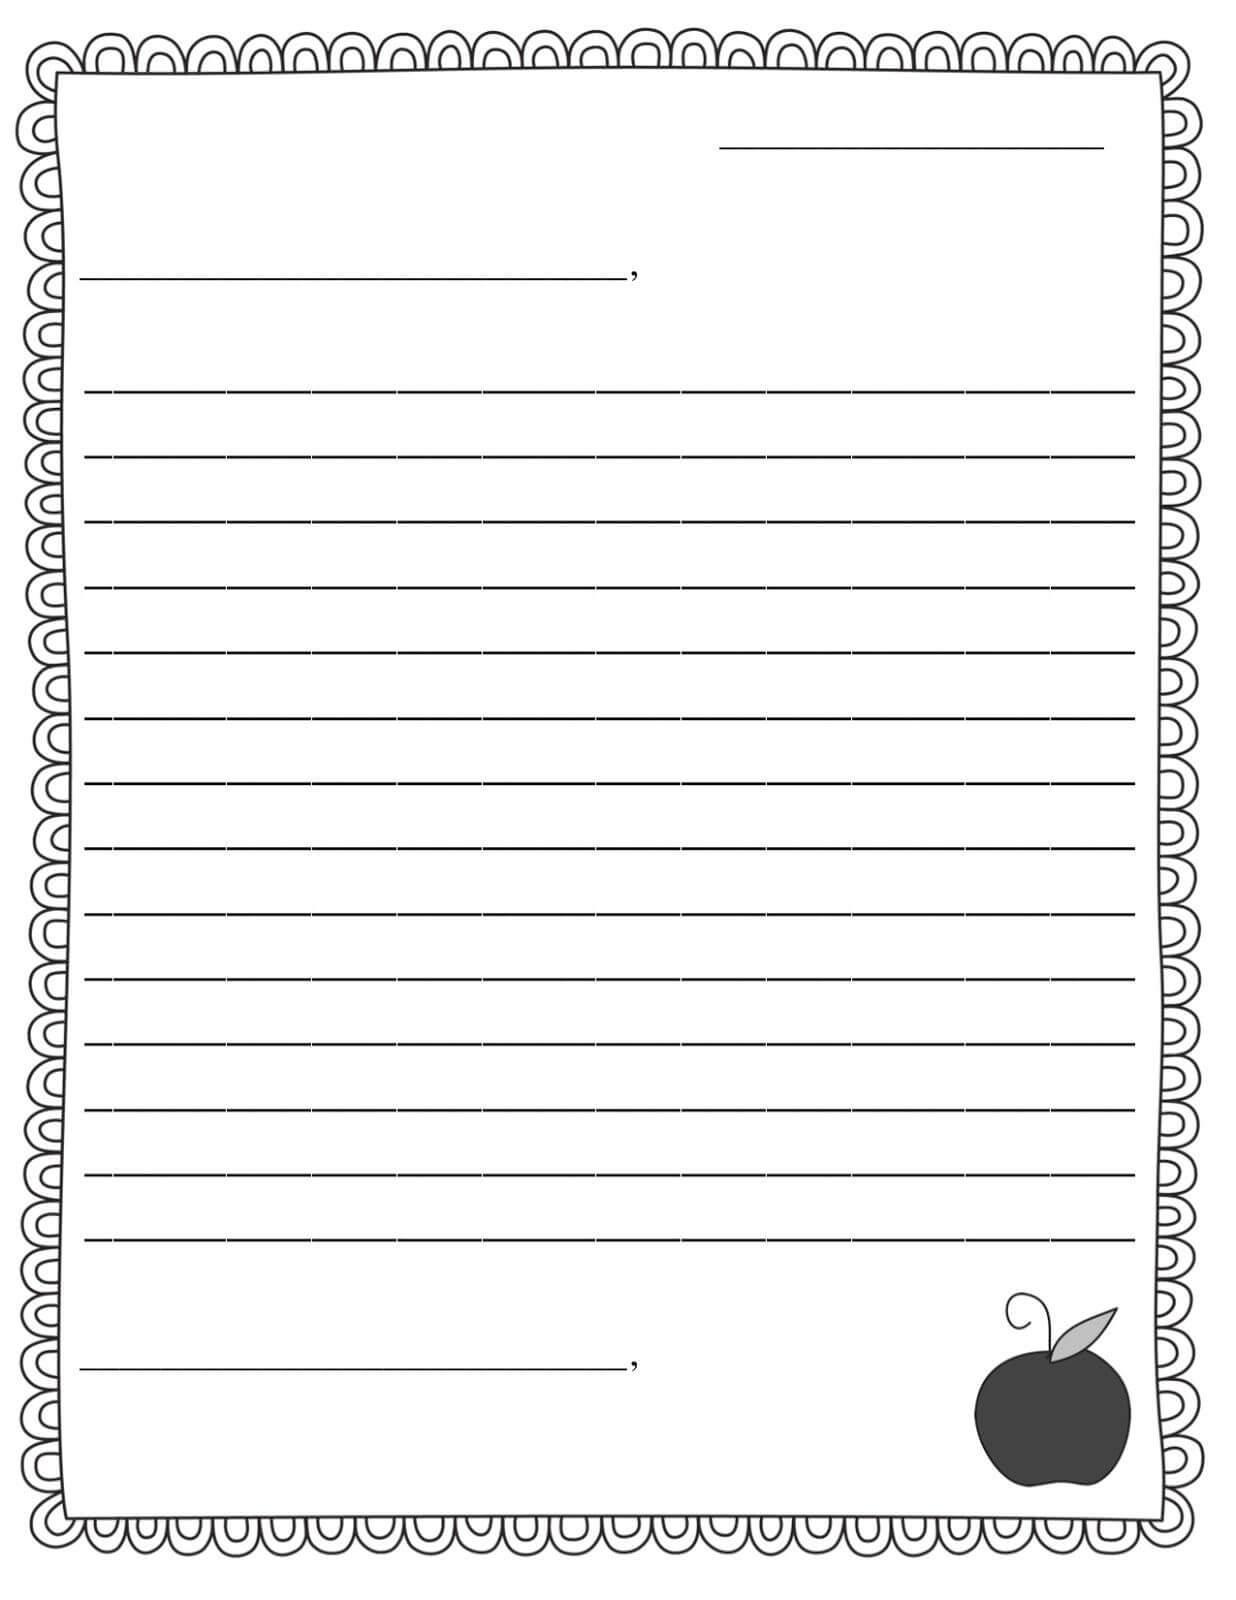 Letter Template 3Abspkjv | Letter Writing Template, Friendly Intended For Blank Letter Writing Template For Kids